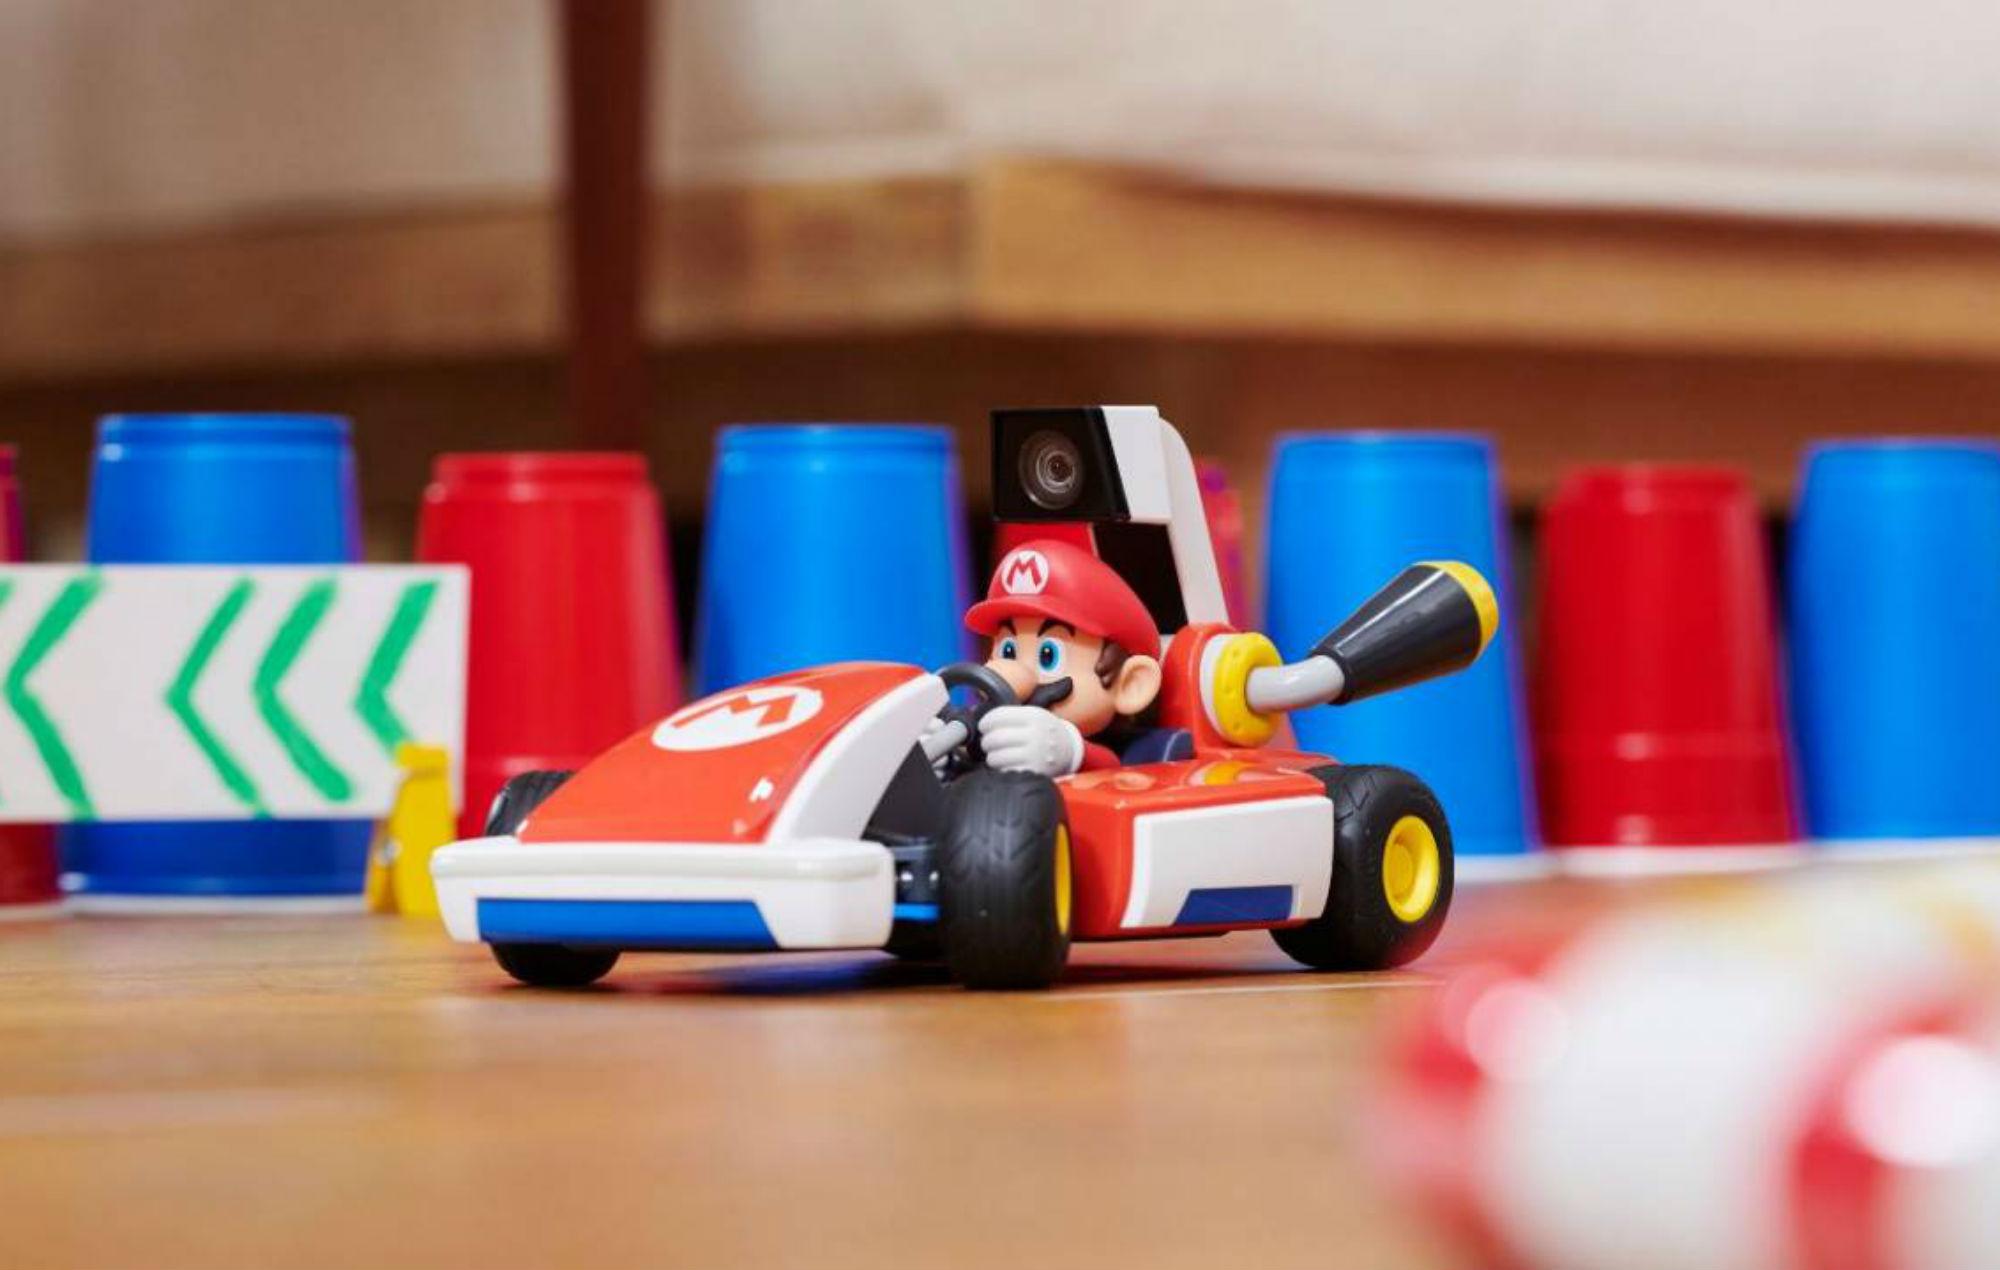 'Mario Kart Wii' streamer sets world record using 'crazy' shortcut